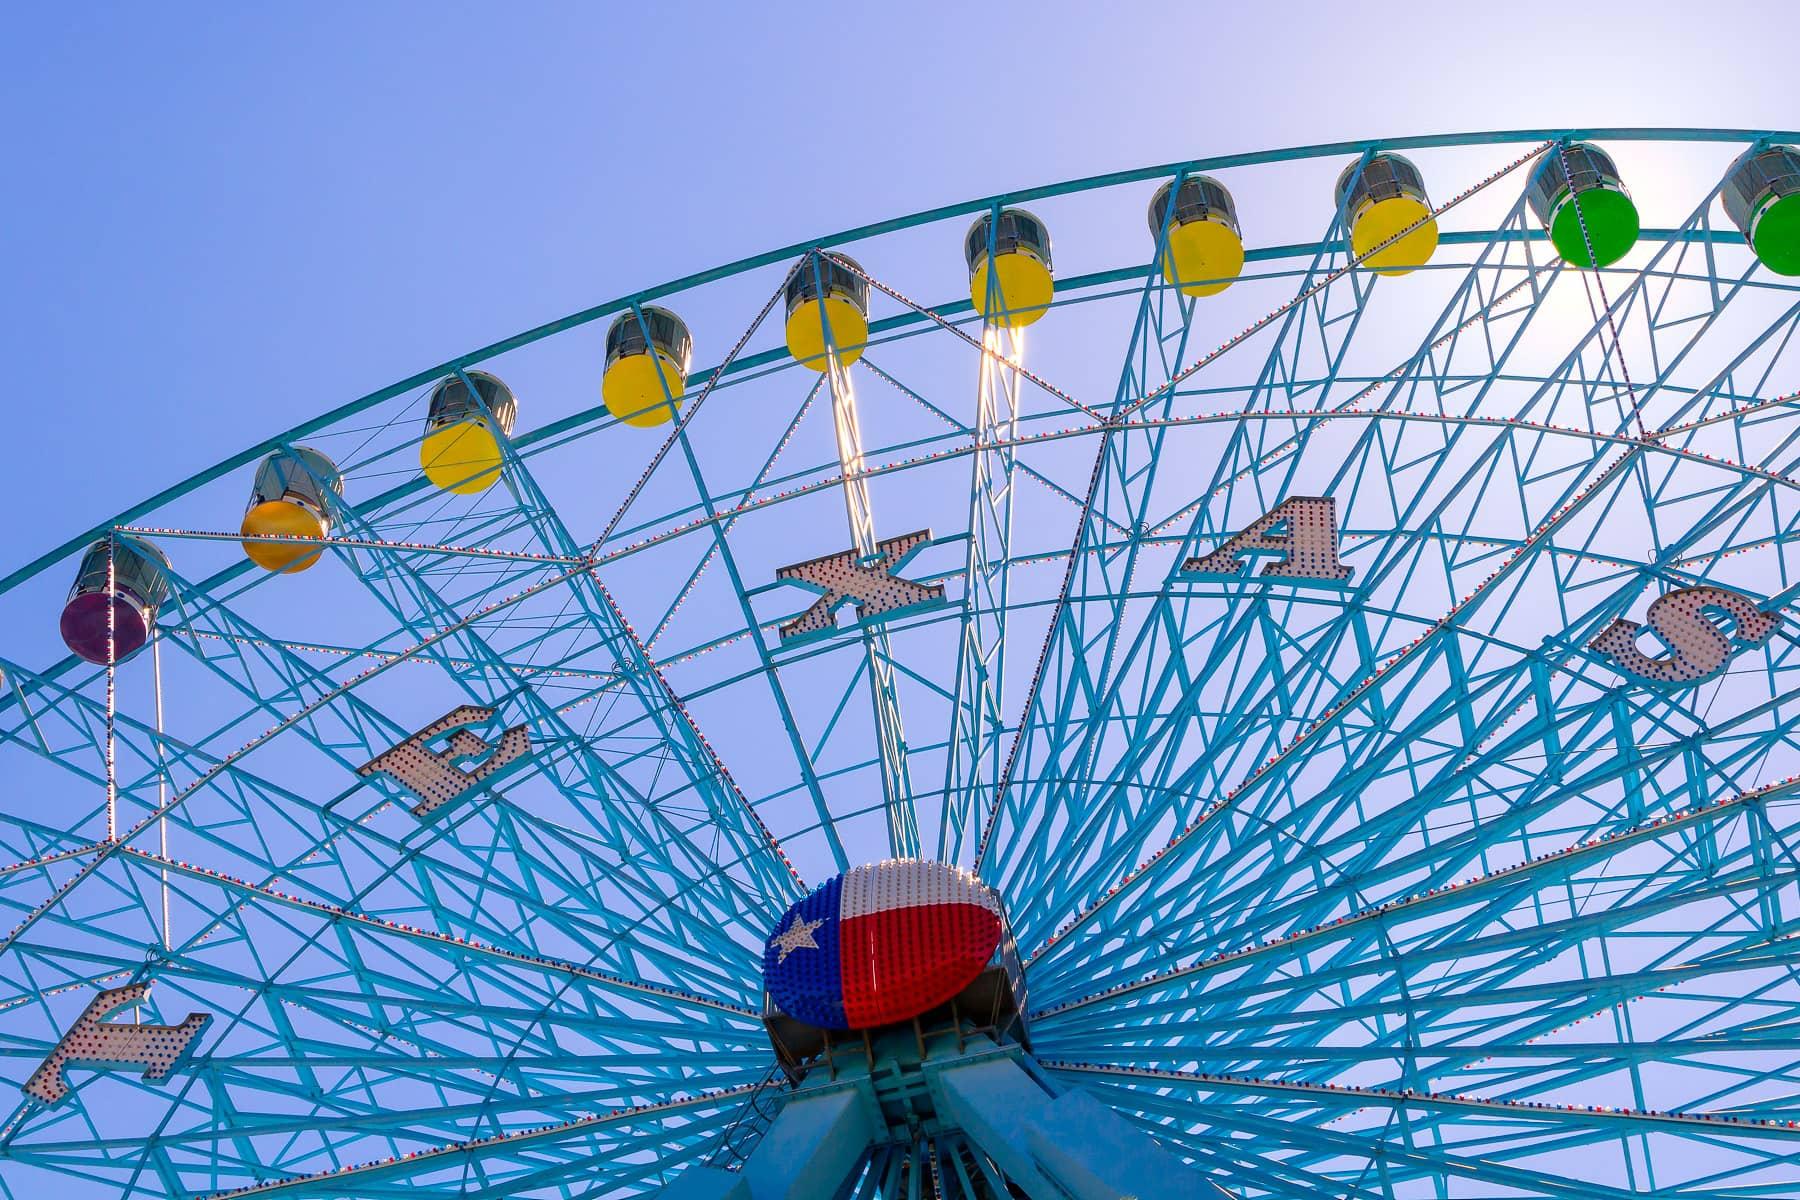 The Texas Star Ferris Wheel rises into the morning sky at Dallas' Fair Park.